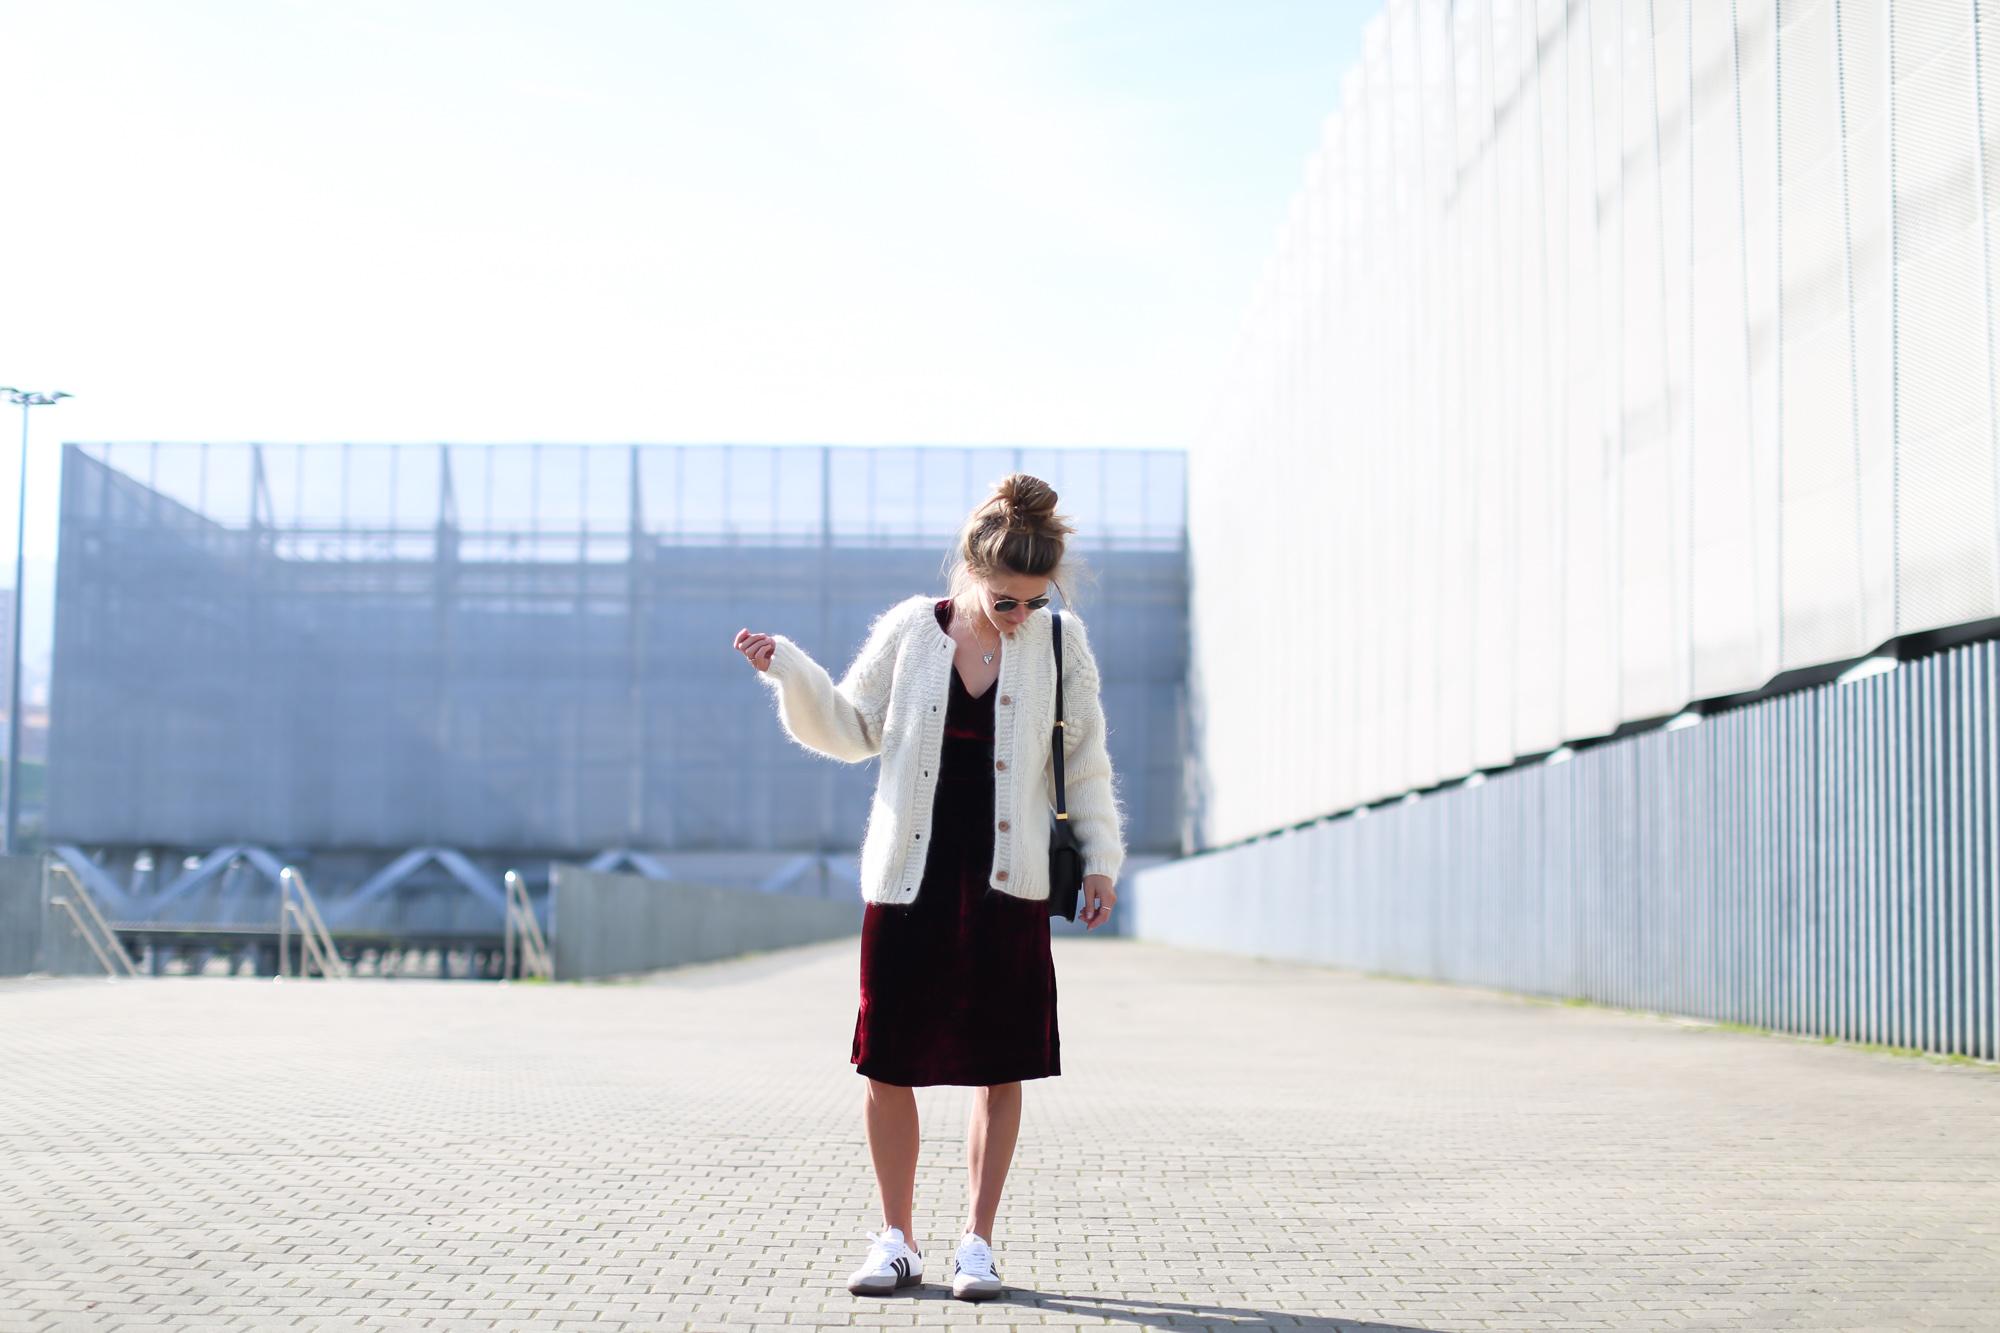 Clochet_streetstyle_fashionblogger_intropia_jerseylanaochosabiertogordito_vestidoterciopelomasscob_adidassambablancas-4